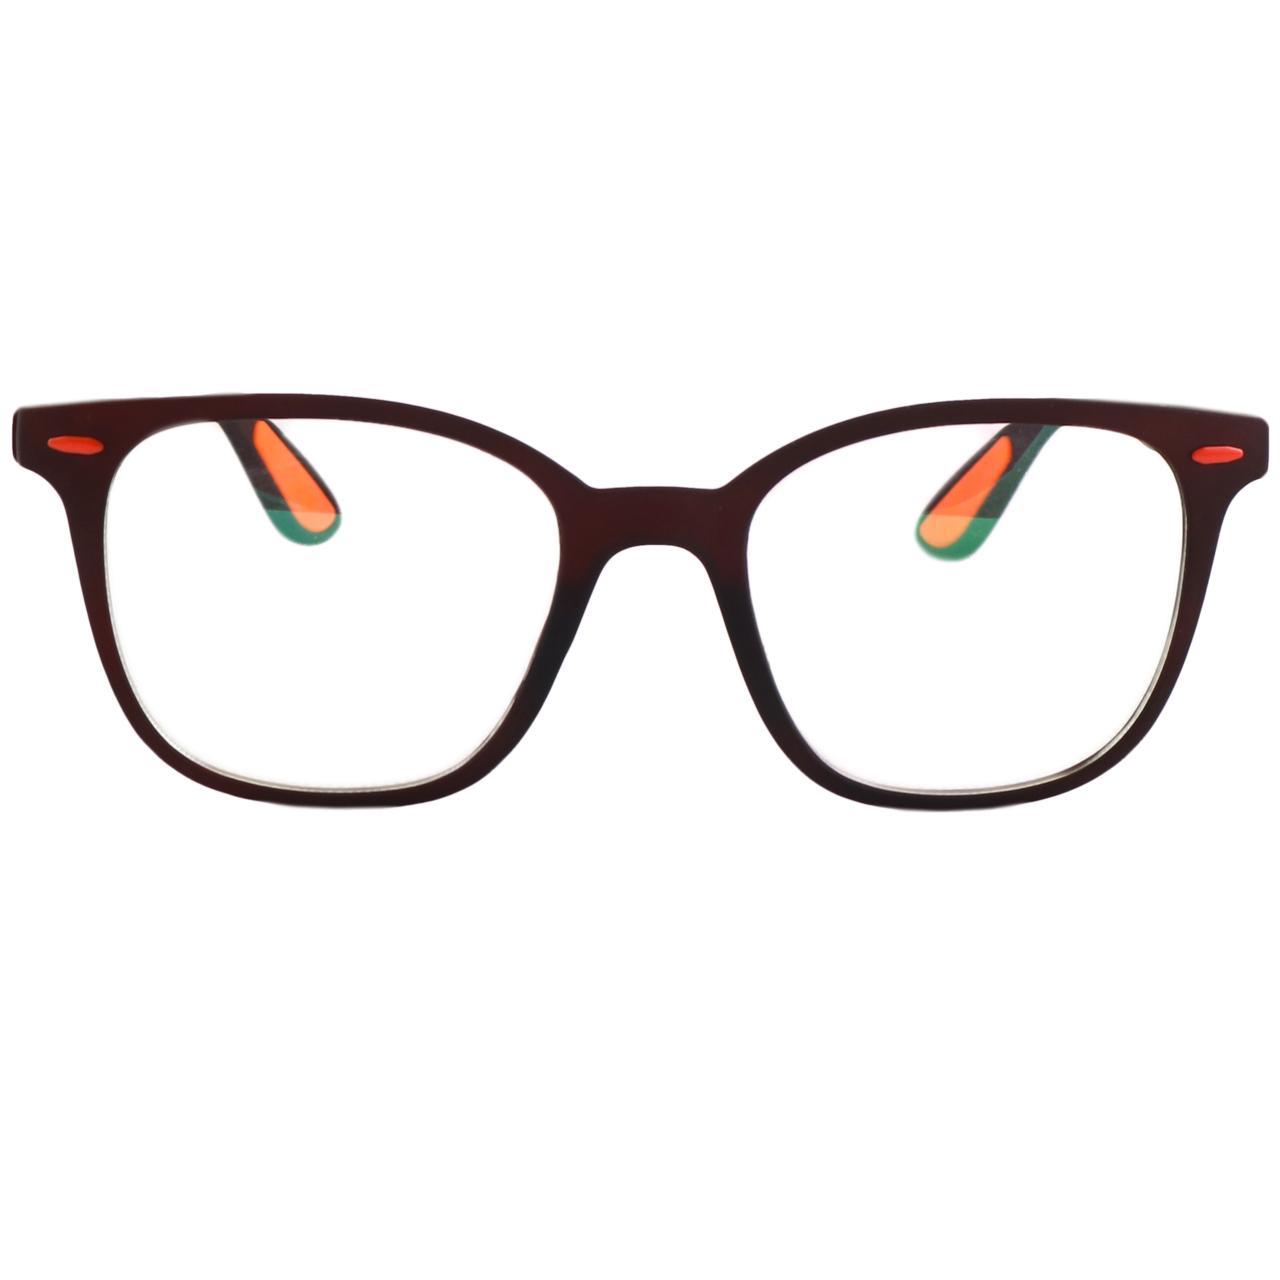 فریم عینک طبی مدل FSHN0035